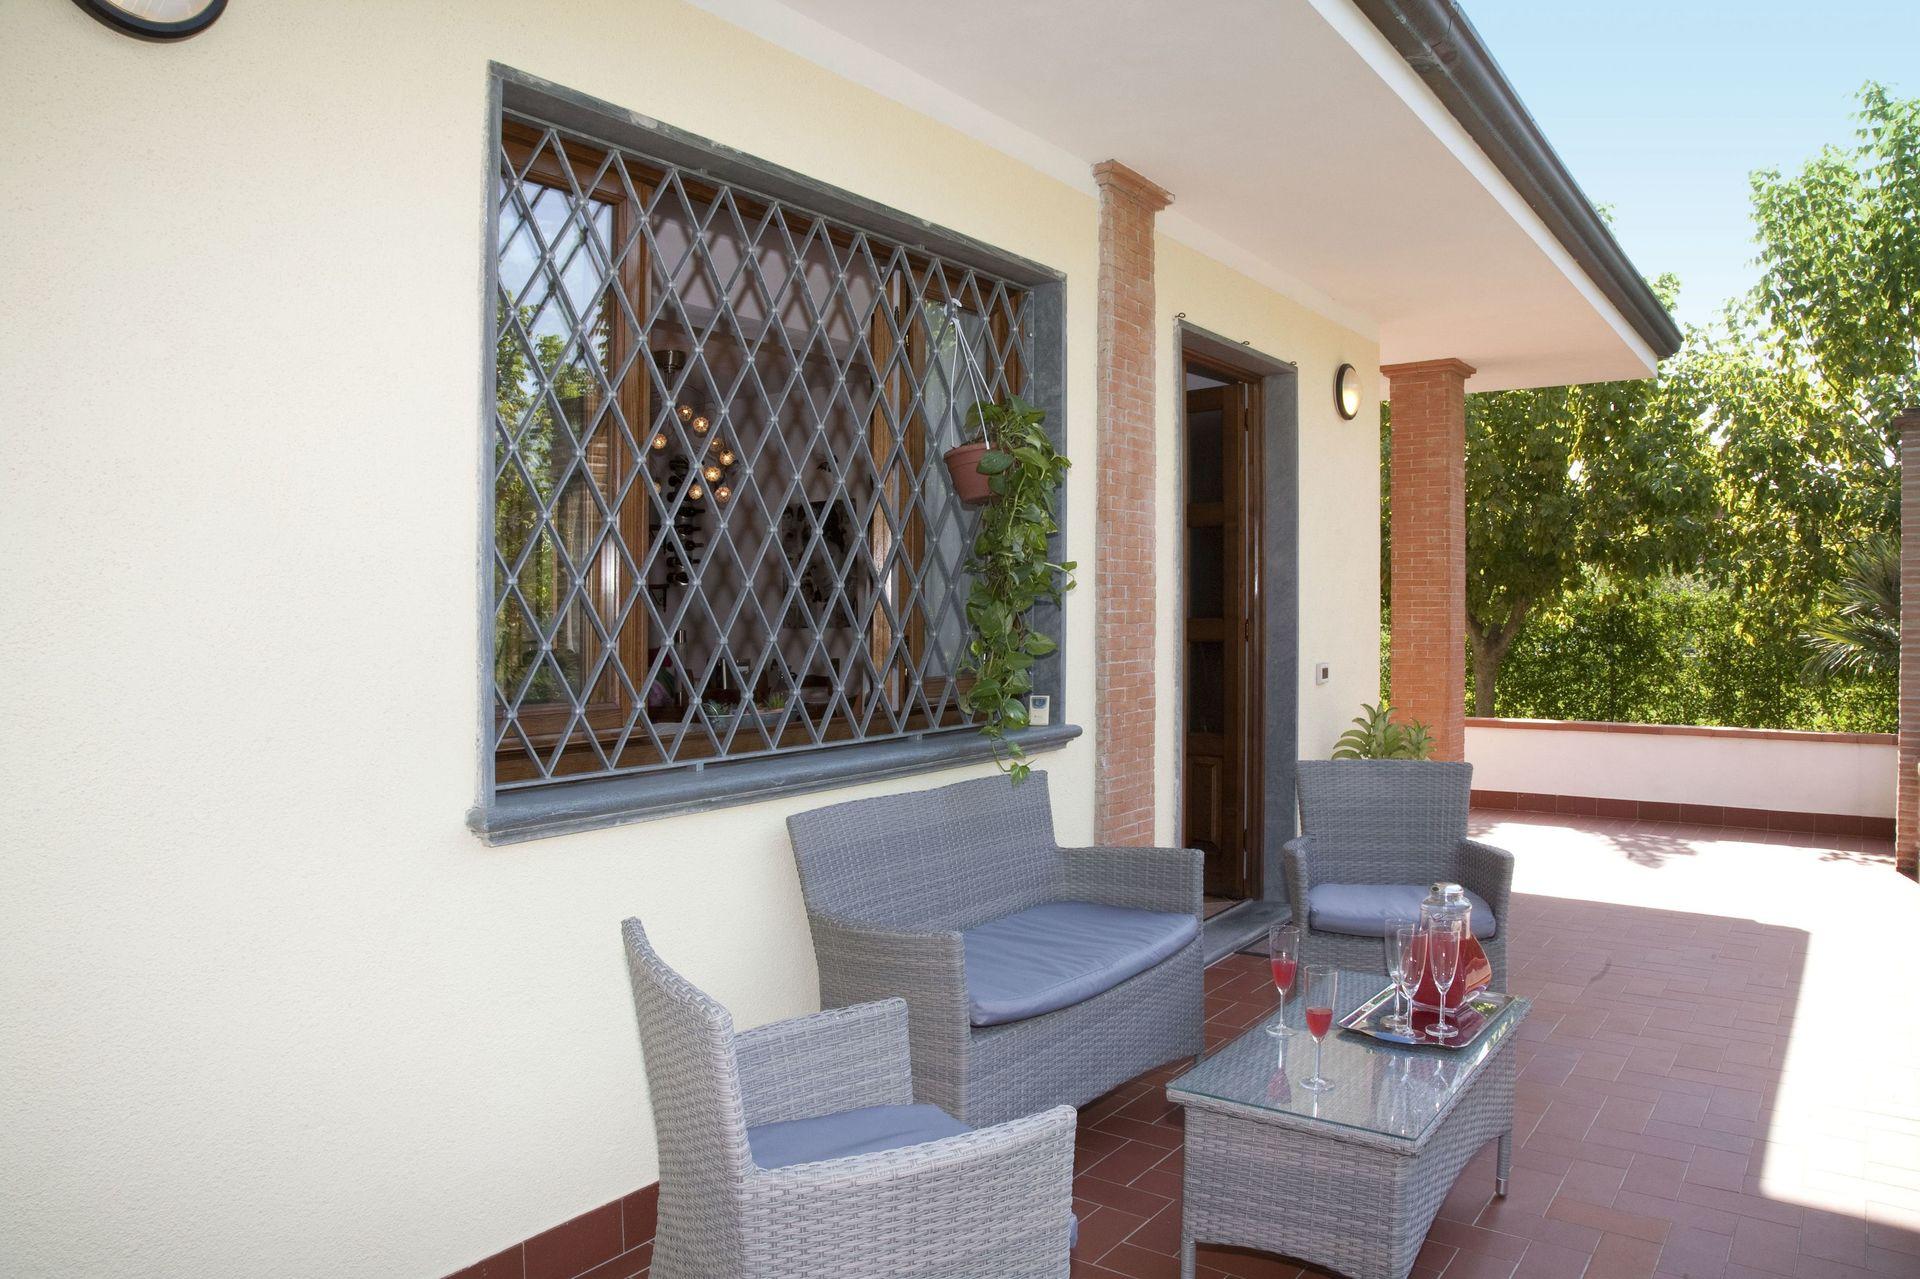 Villa Chiara Villa That Sleeps 4 People In 2 Bedrooms